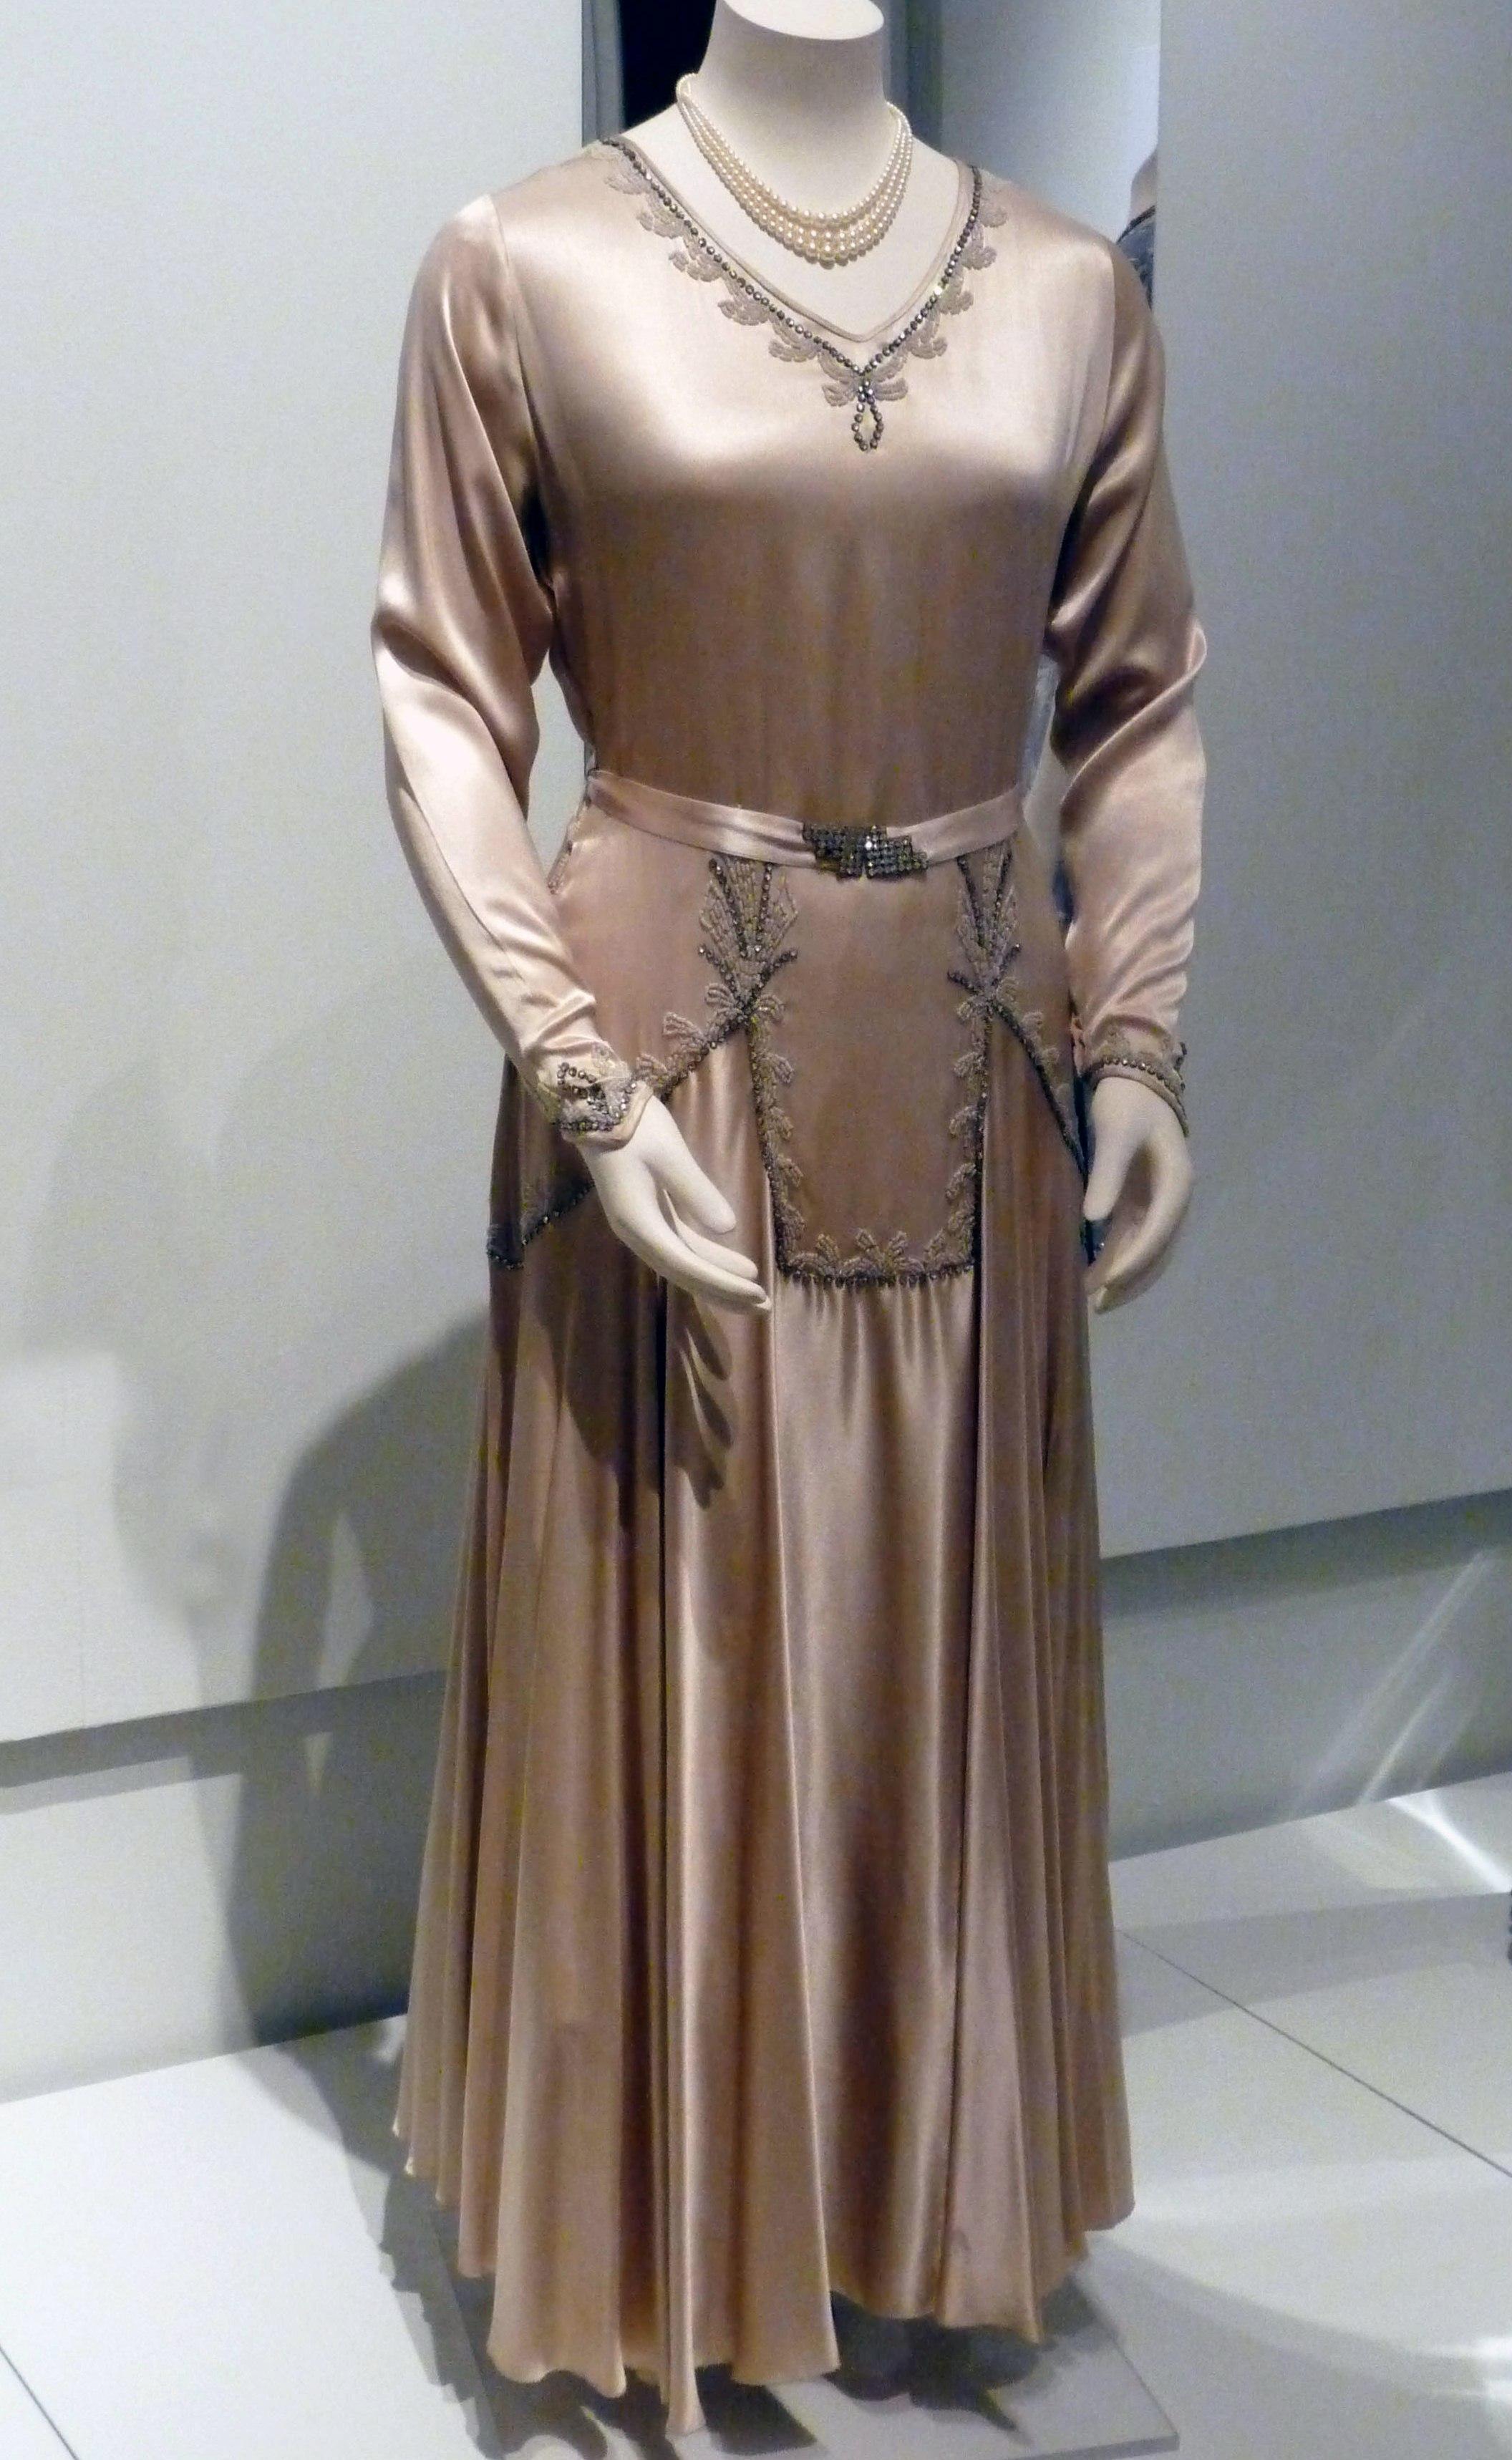 Wedding dress, silk satin with applied pearls & diamante beads, 1930